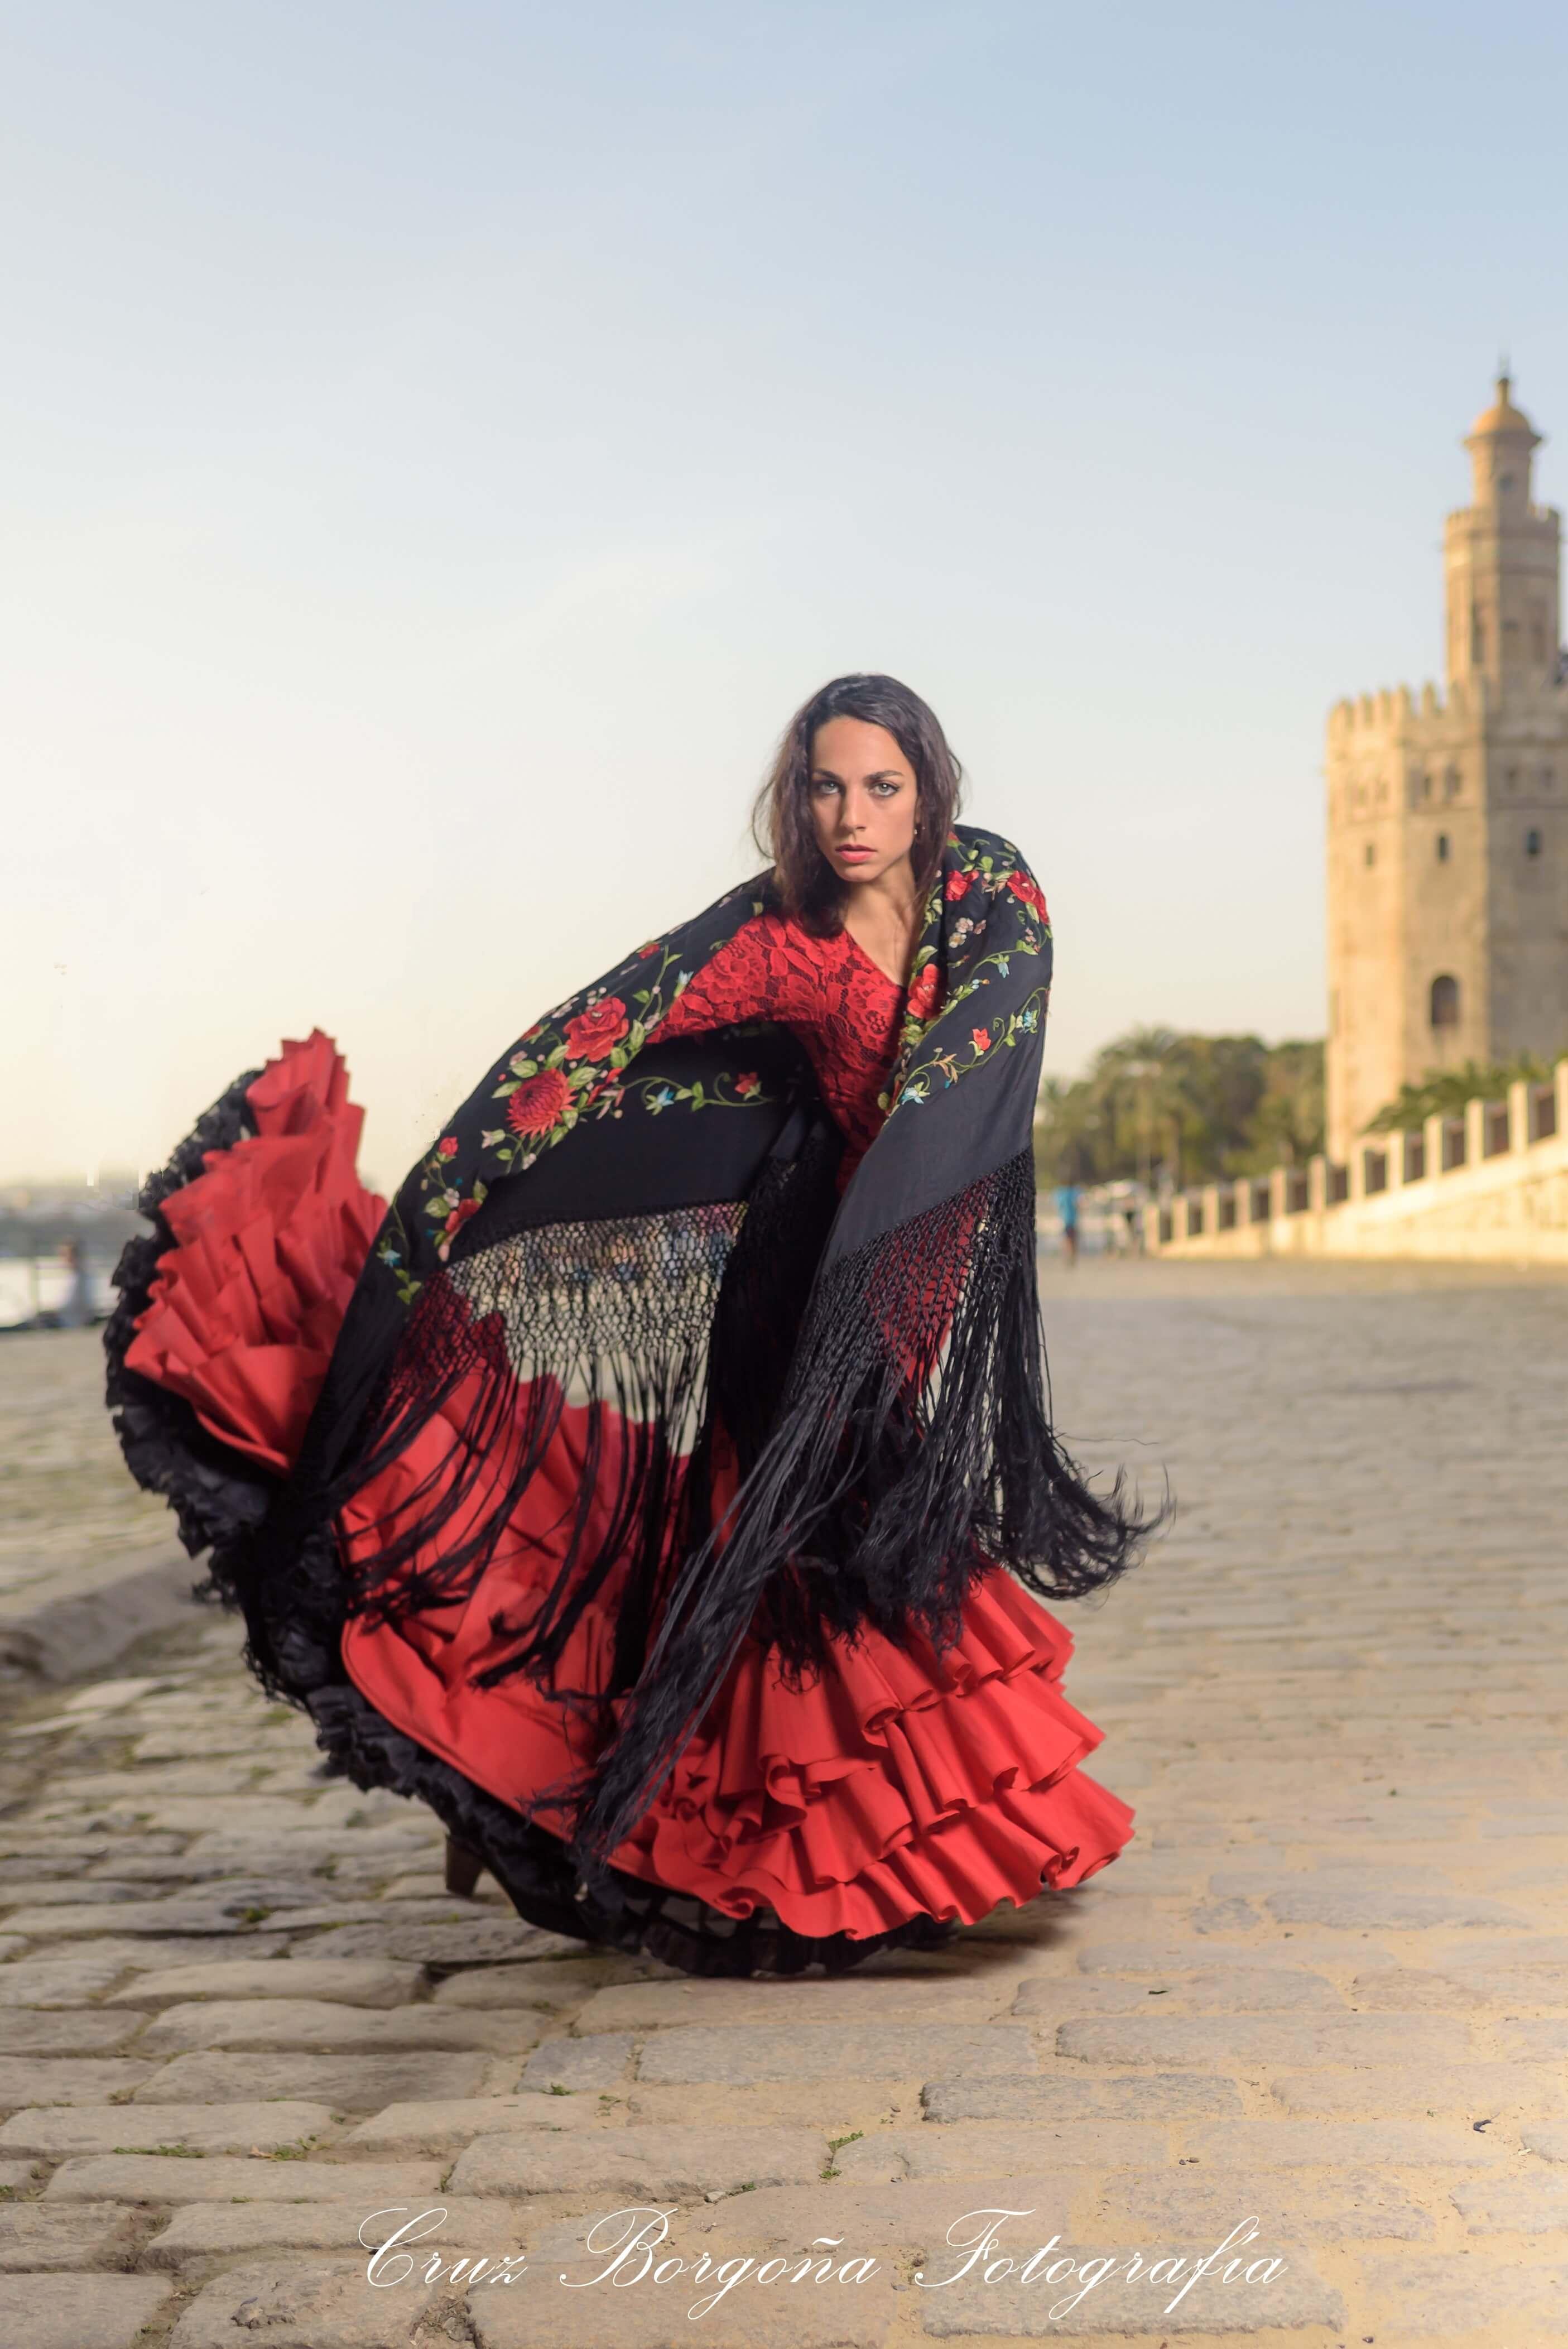 Callejondo Flamenco Dance & Music from Spain